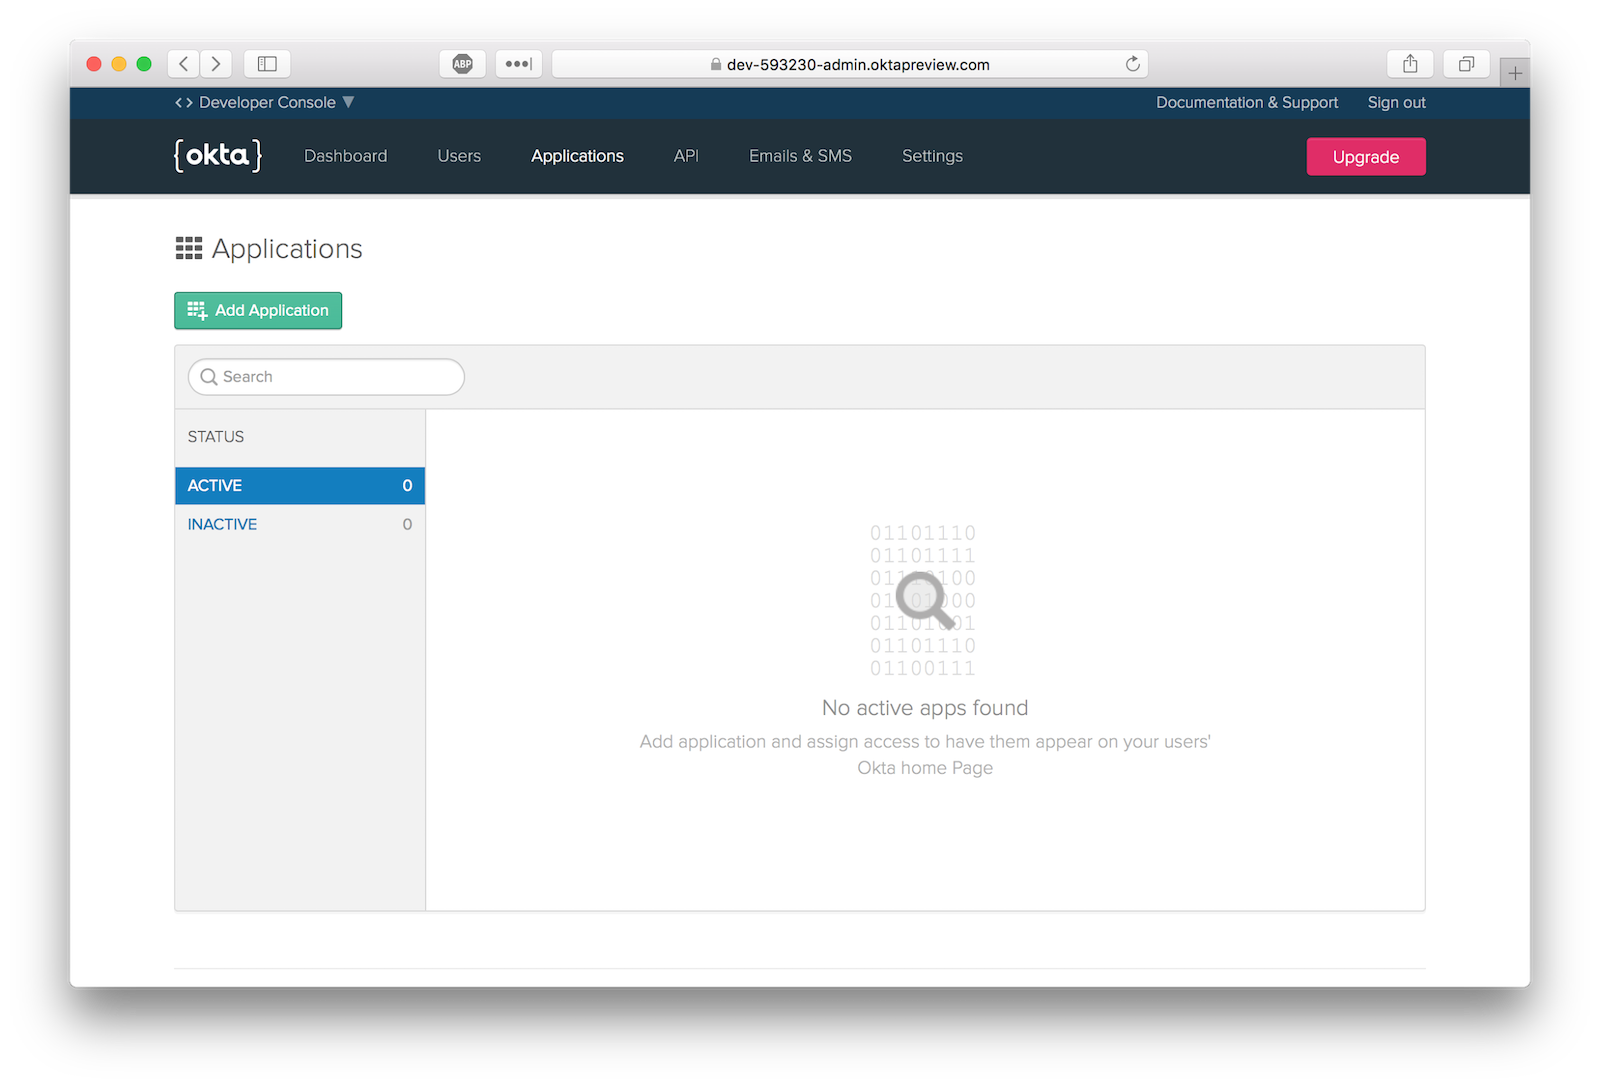 Build a Single-Page App with Go and Vue | Okta Developer